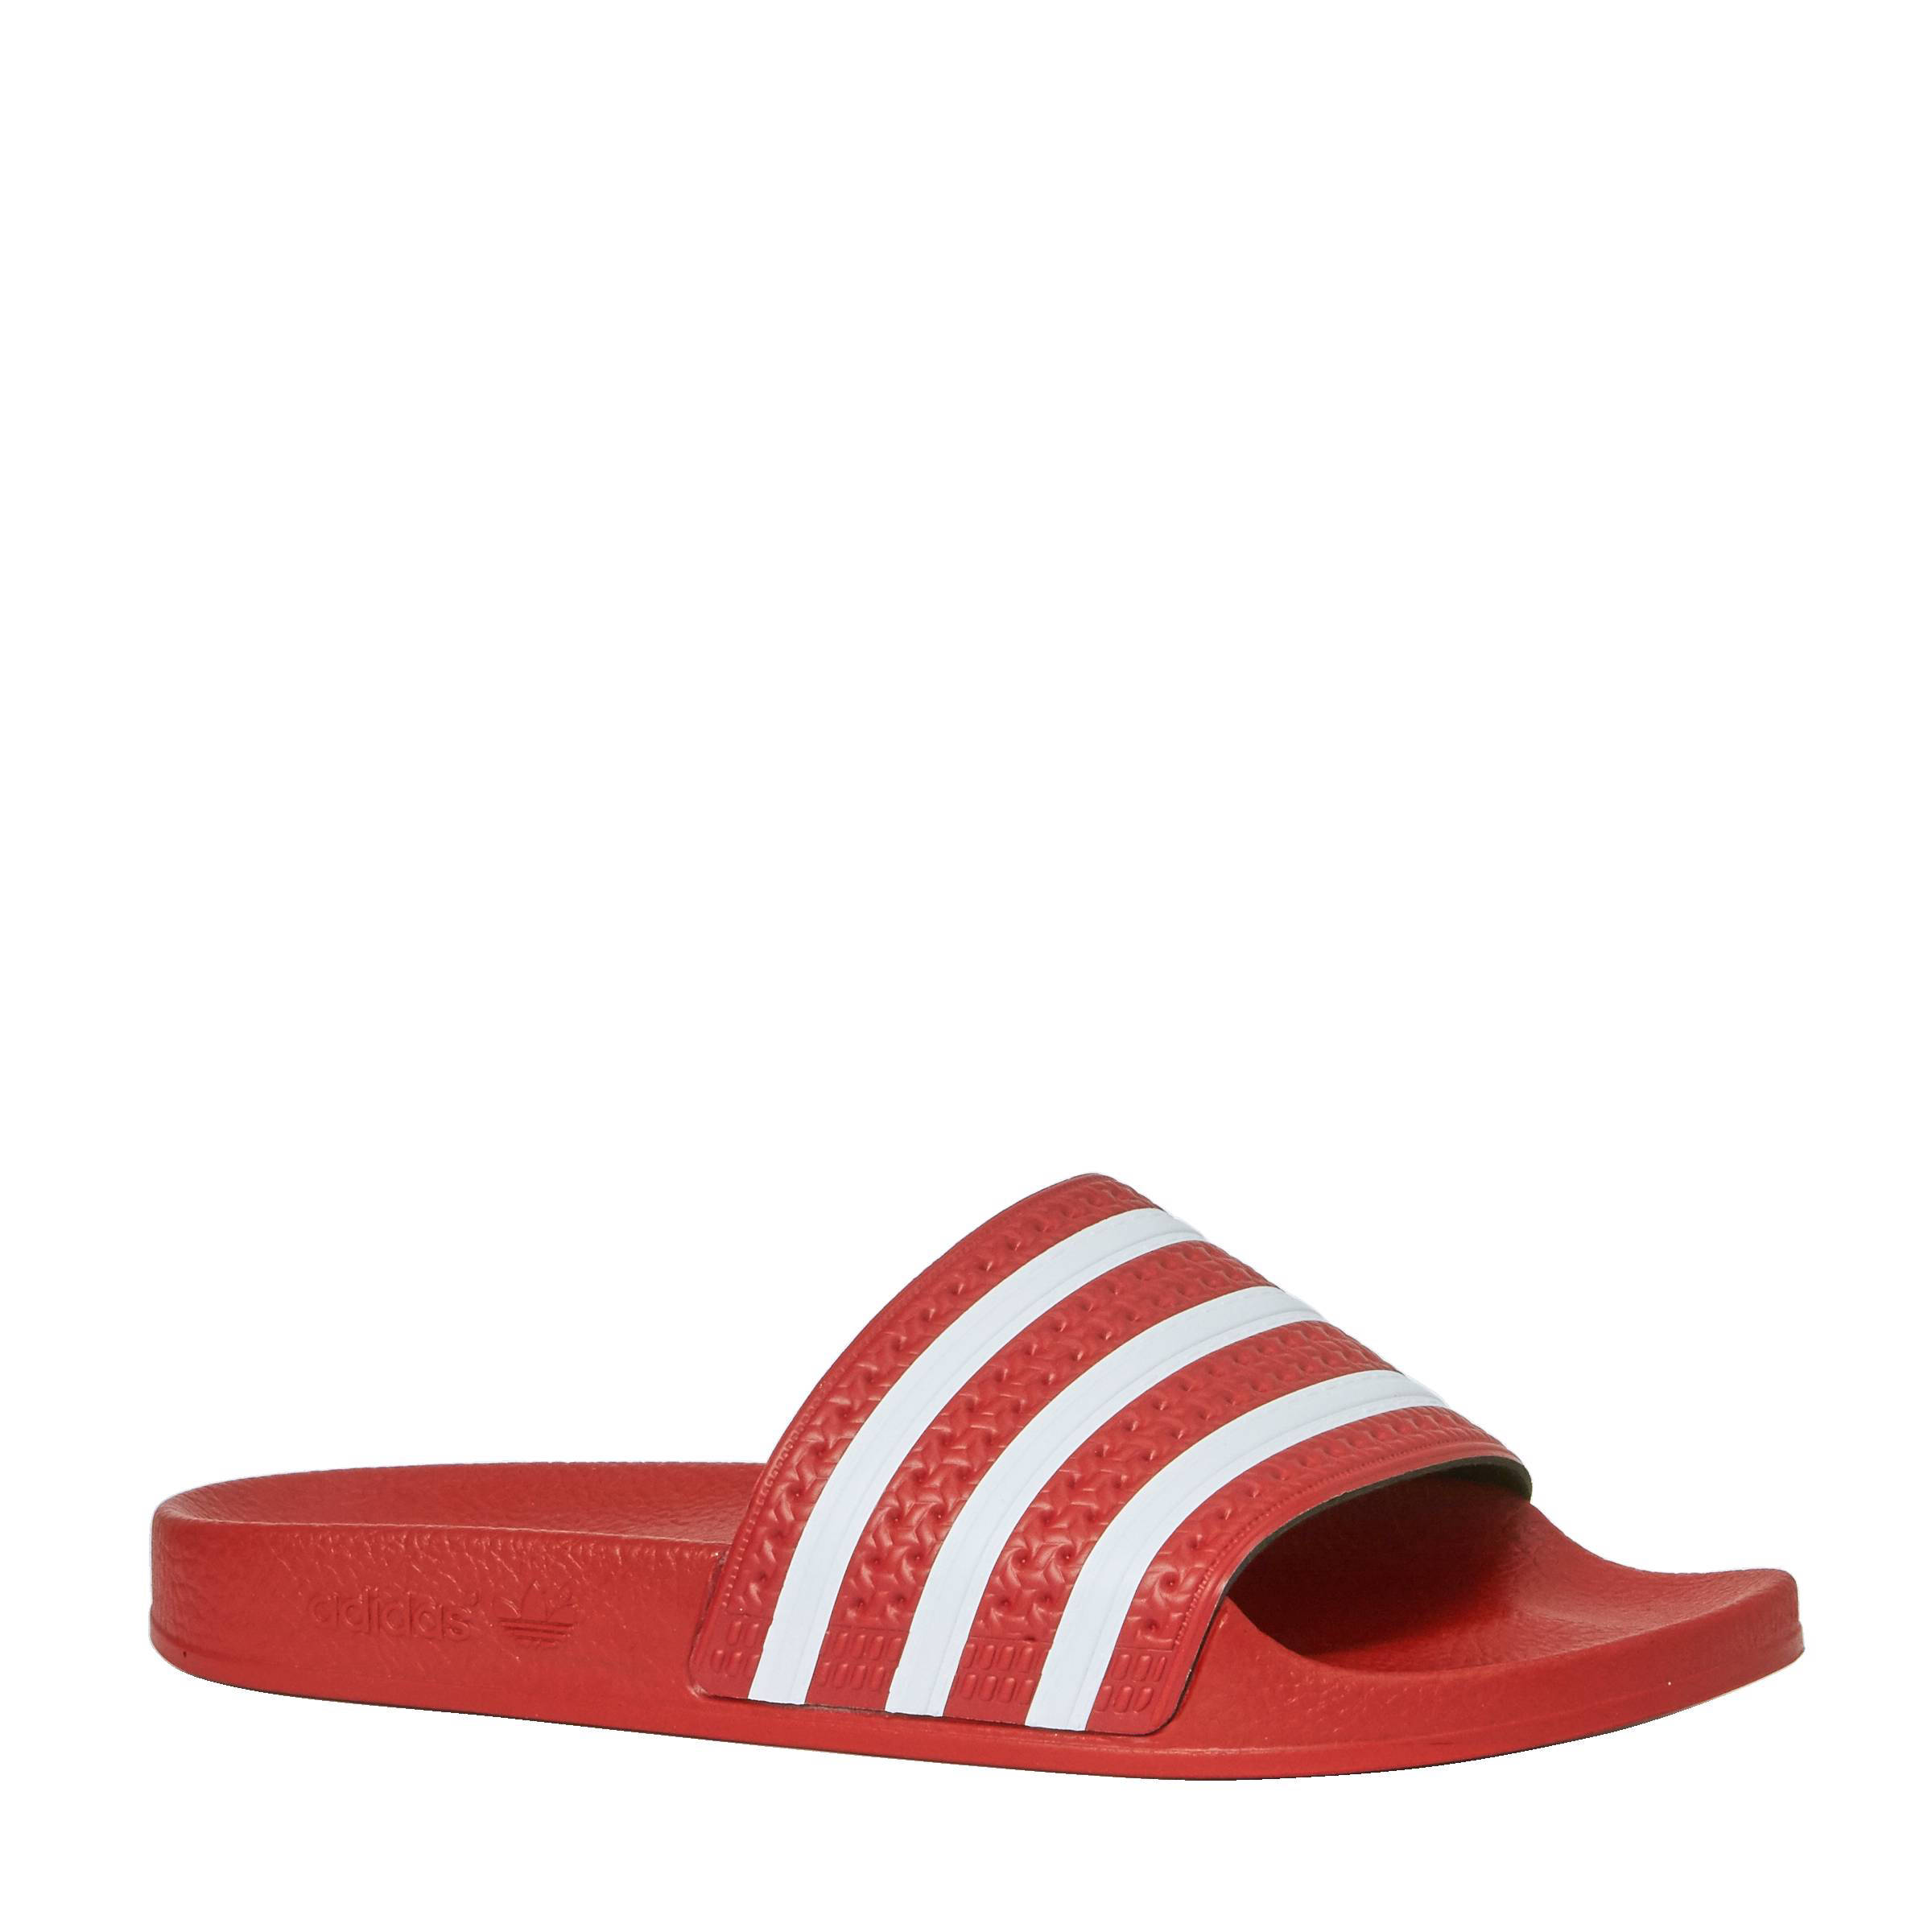 Adidas Slippers Sale India Adidas Adilette Cloudfoam Plus